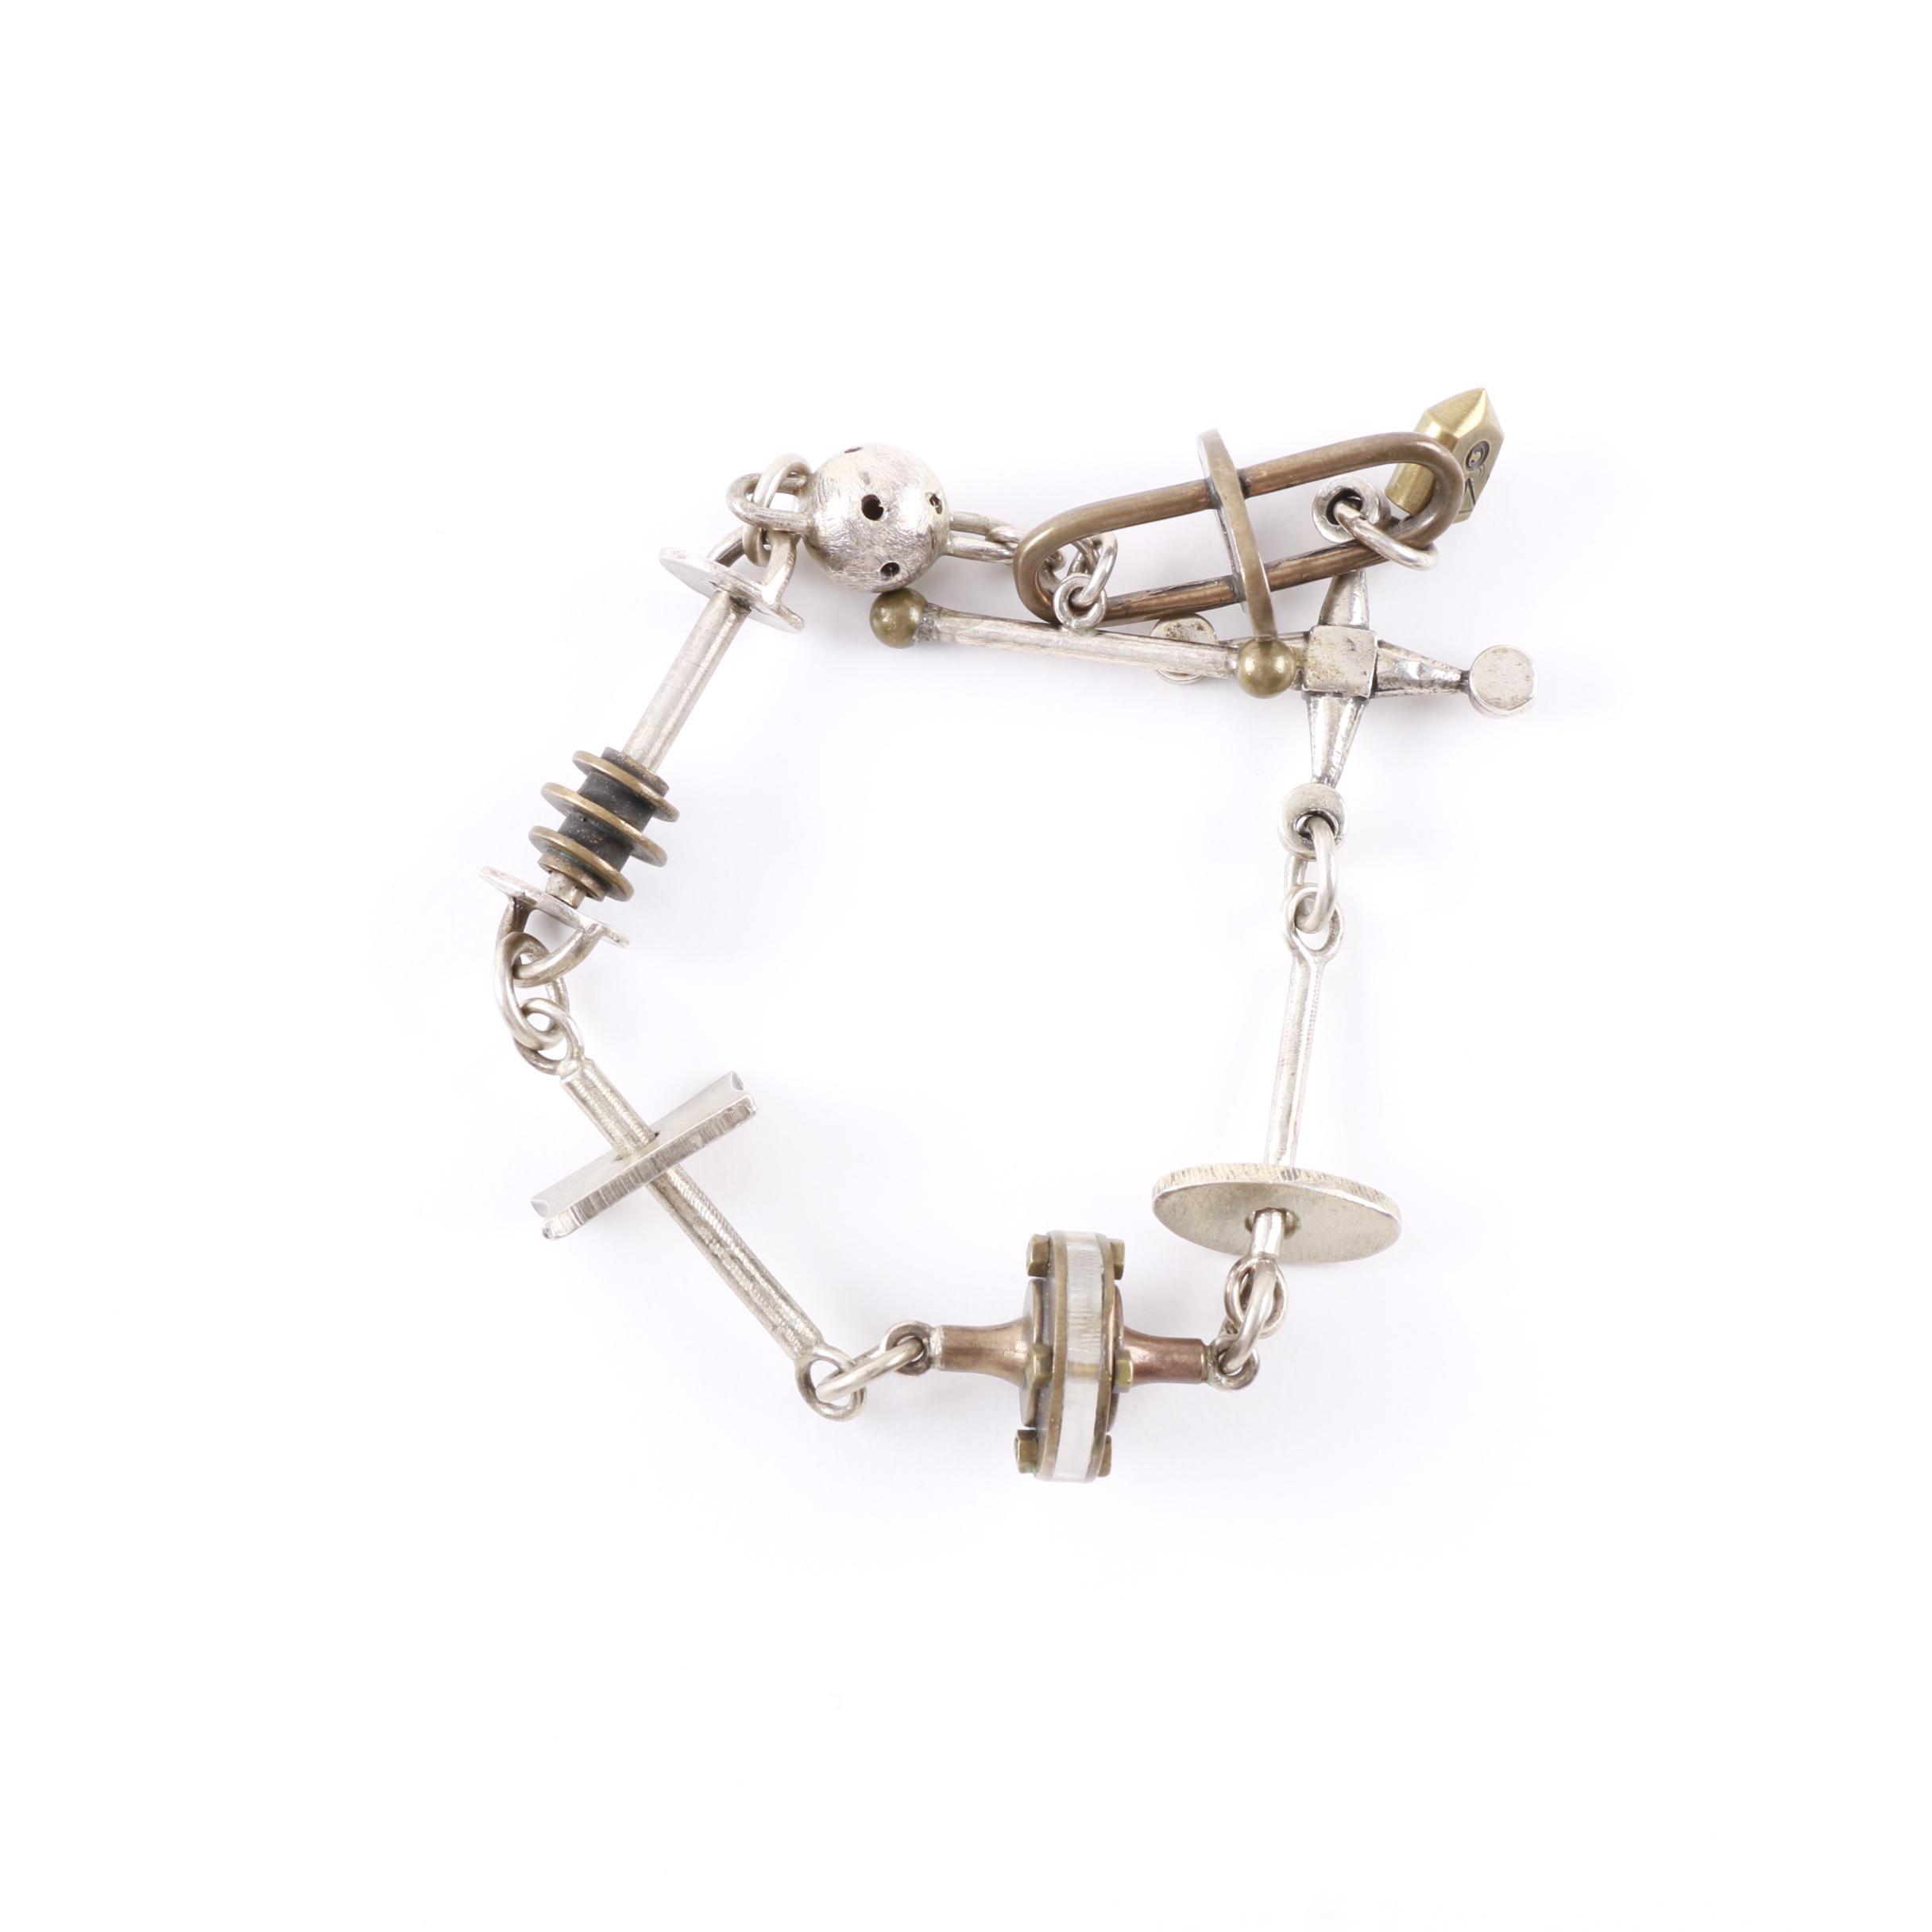 Thomas Mann Constructivist Sterling Silver Collage Bracelet